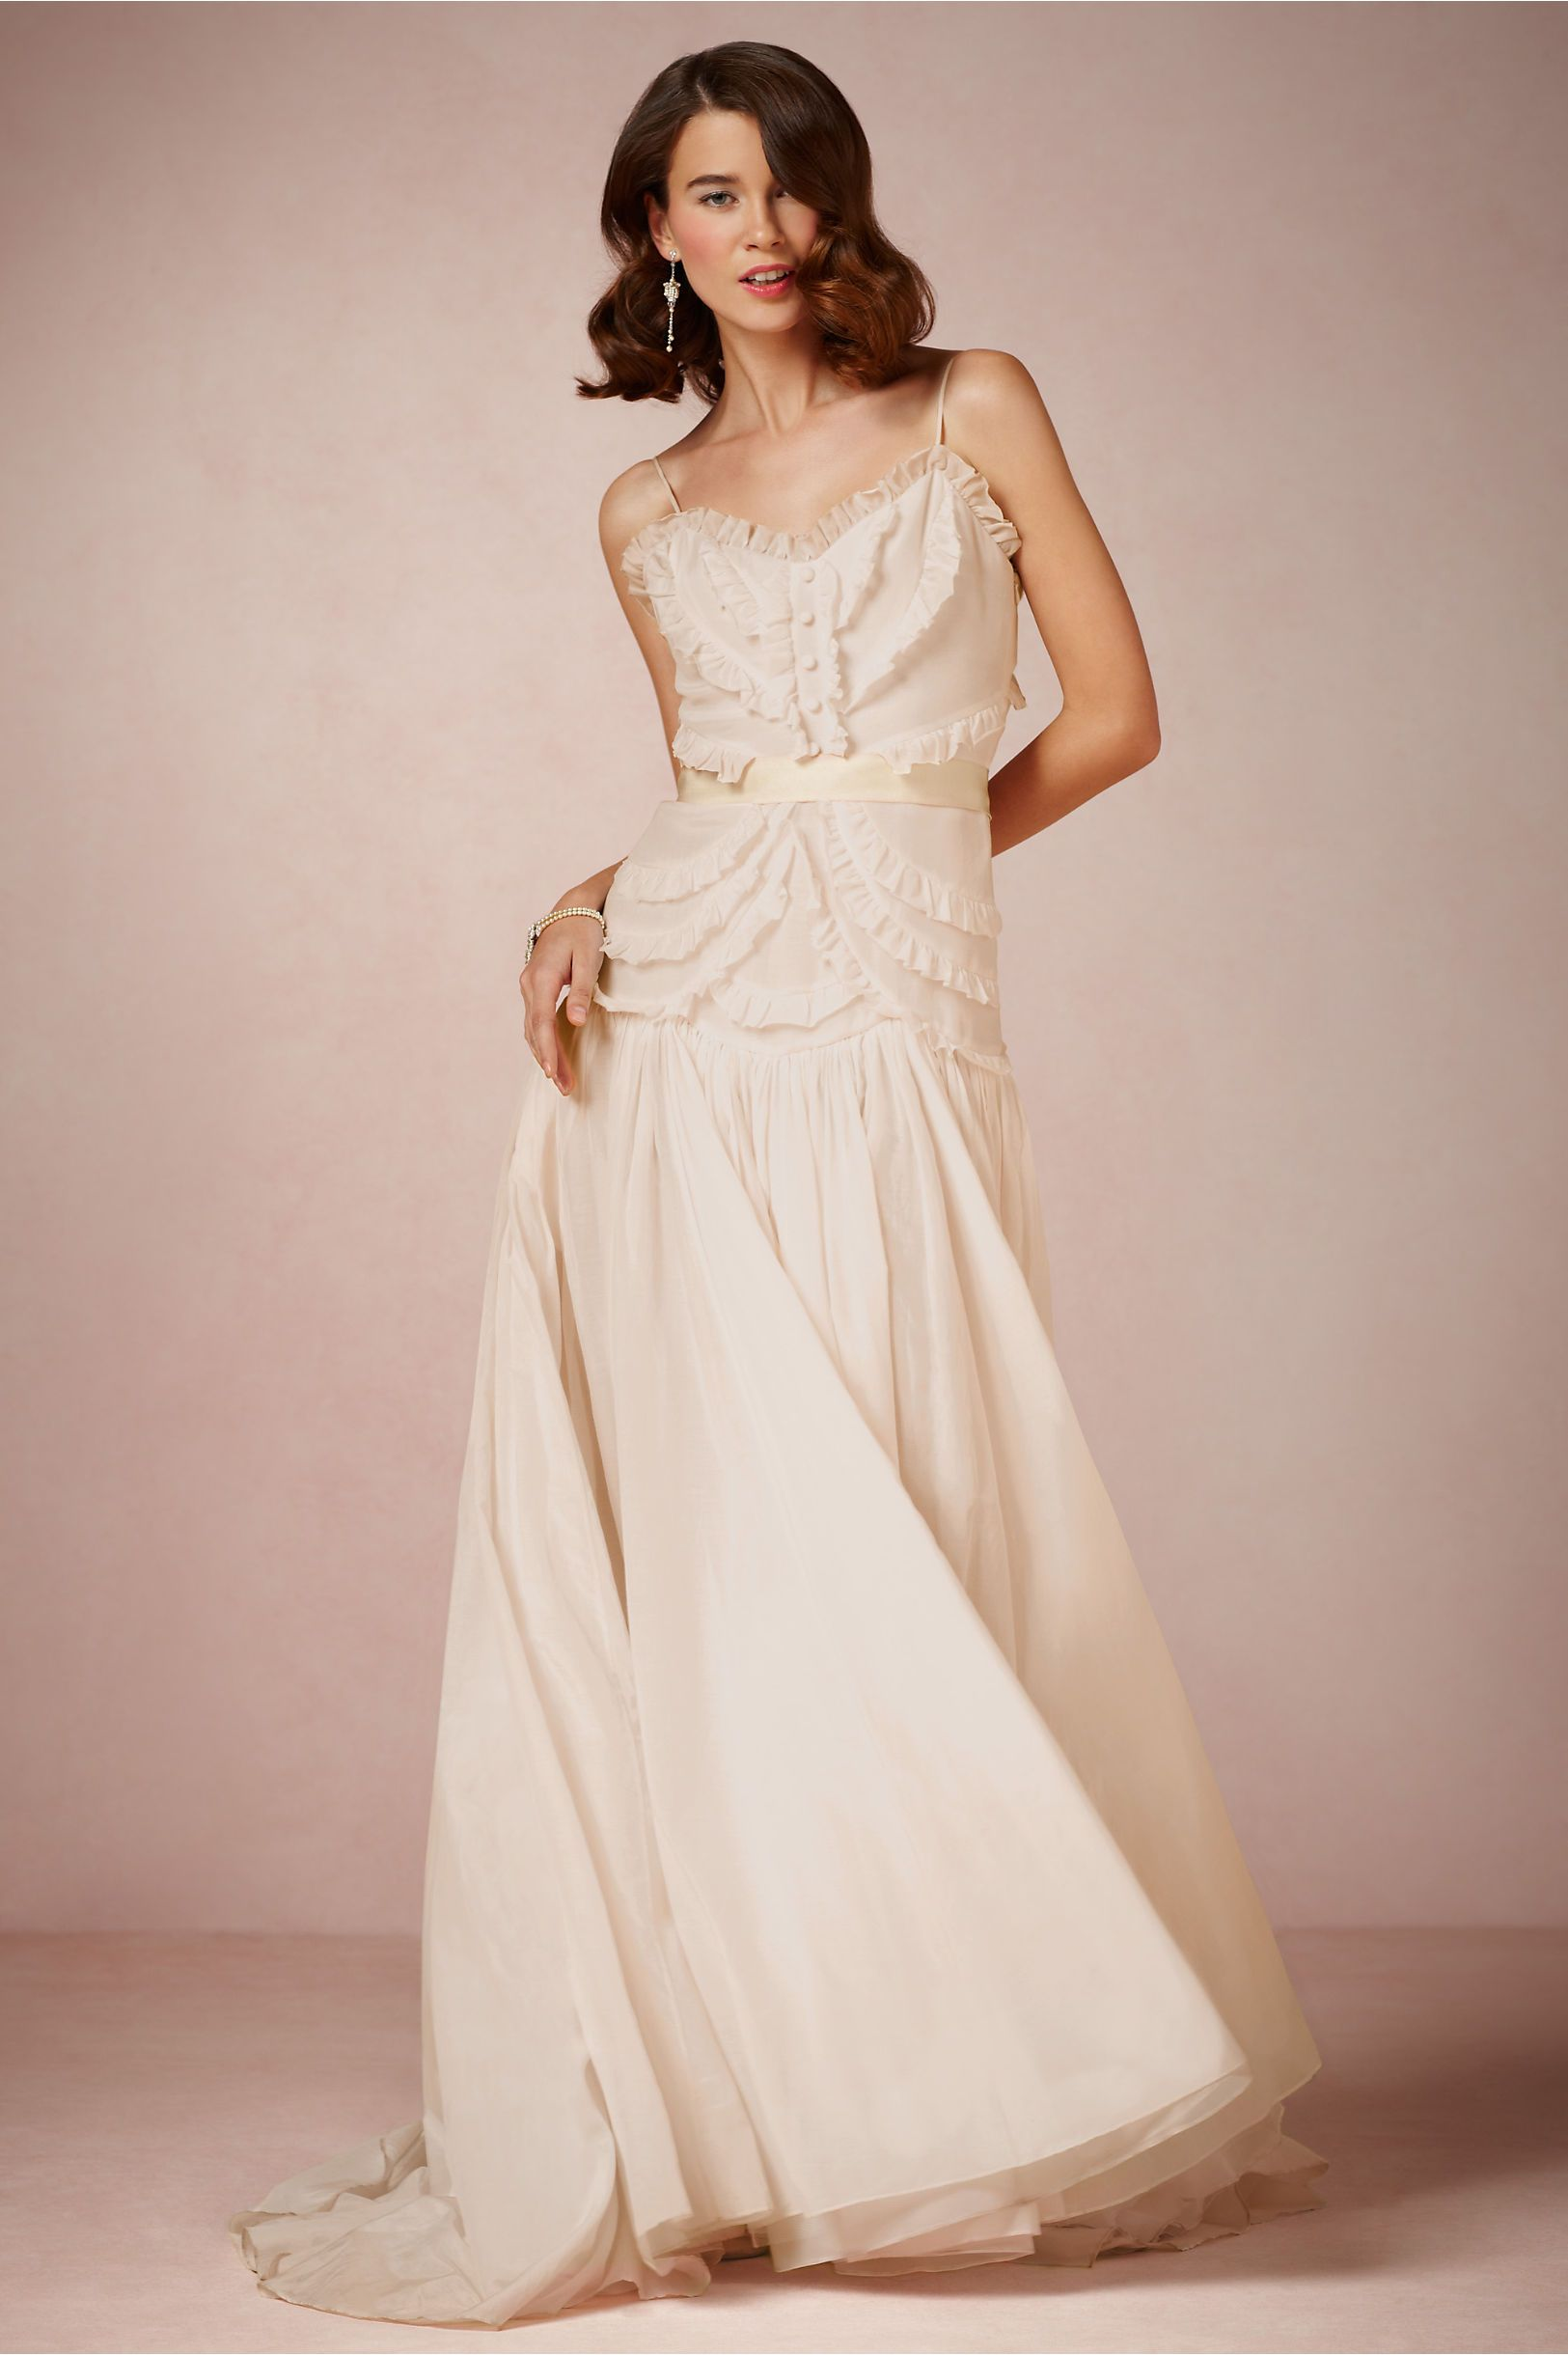 Hannah-pale green tulle wedding skirt Wedding dress-ready to wear